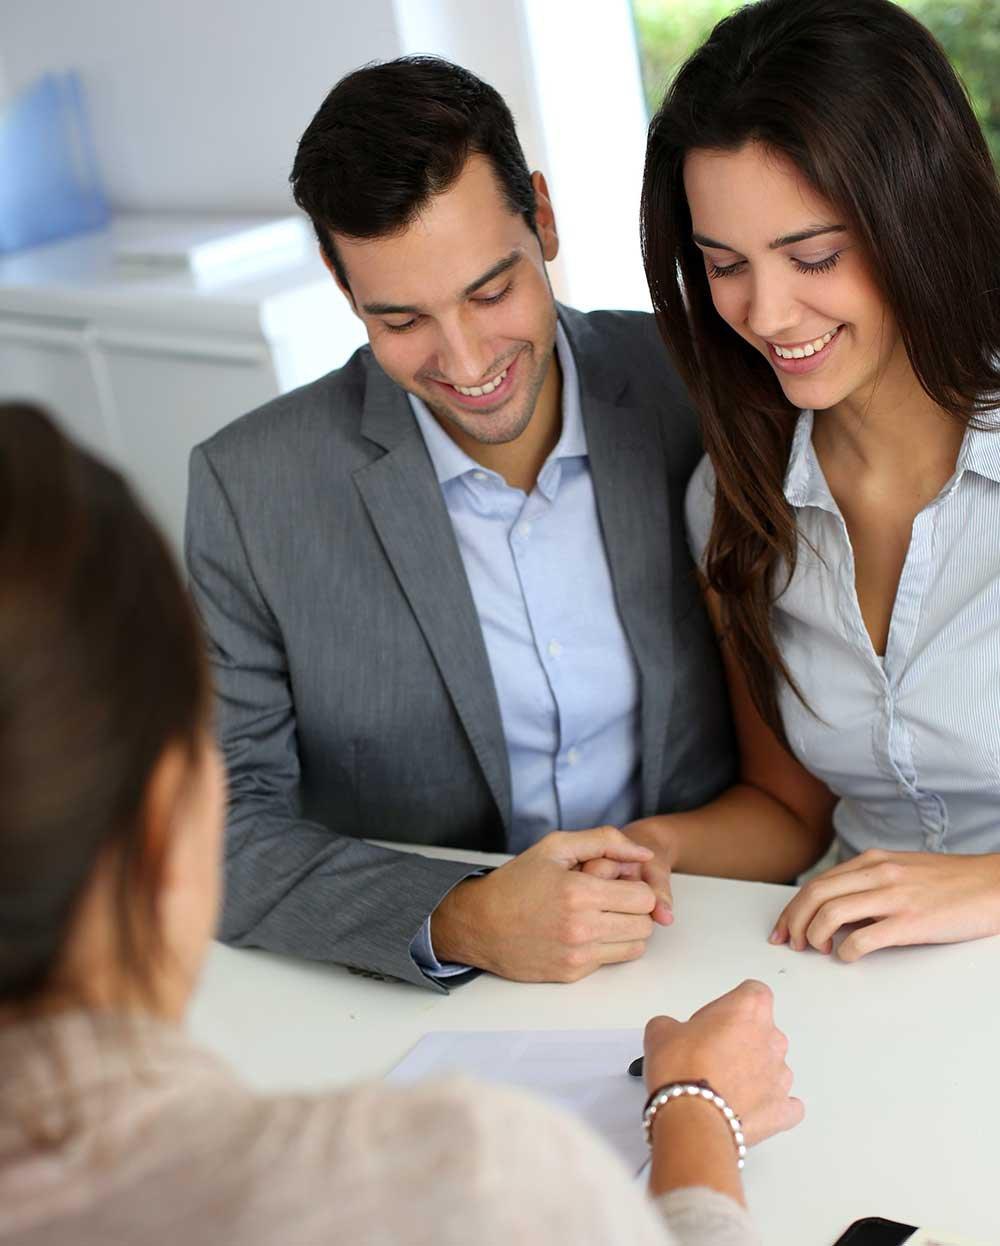 PrimeWay Flex Personal Loan Features